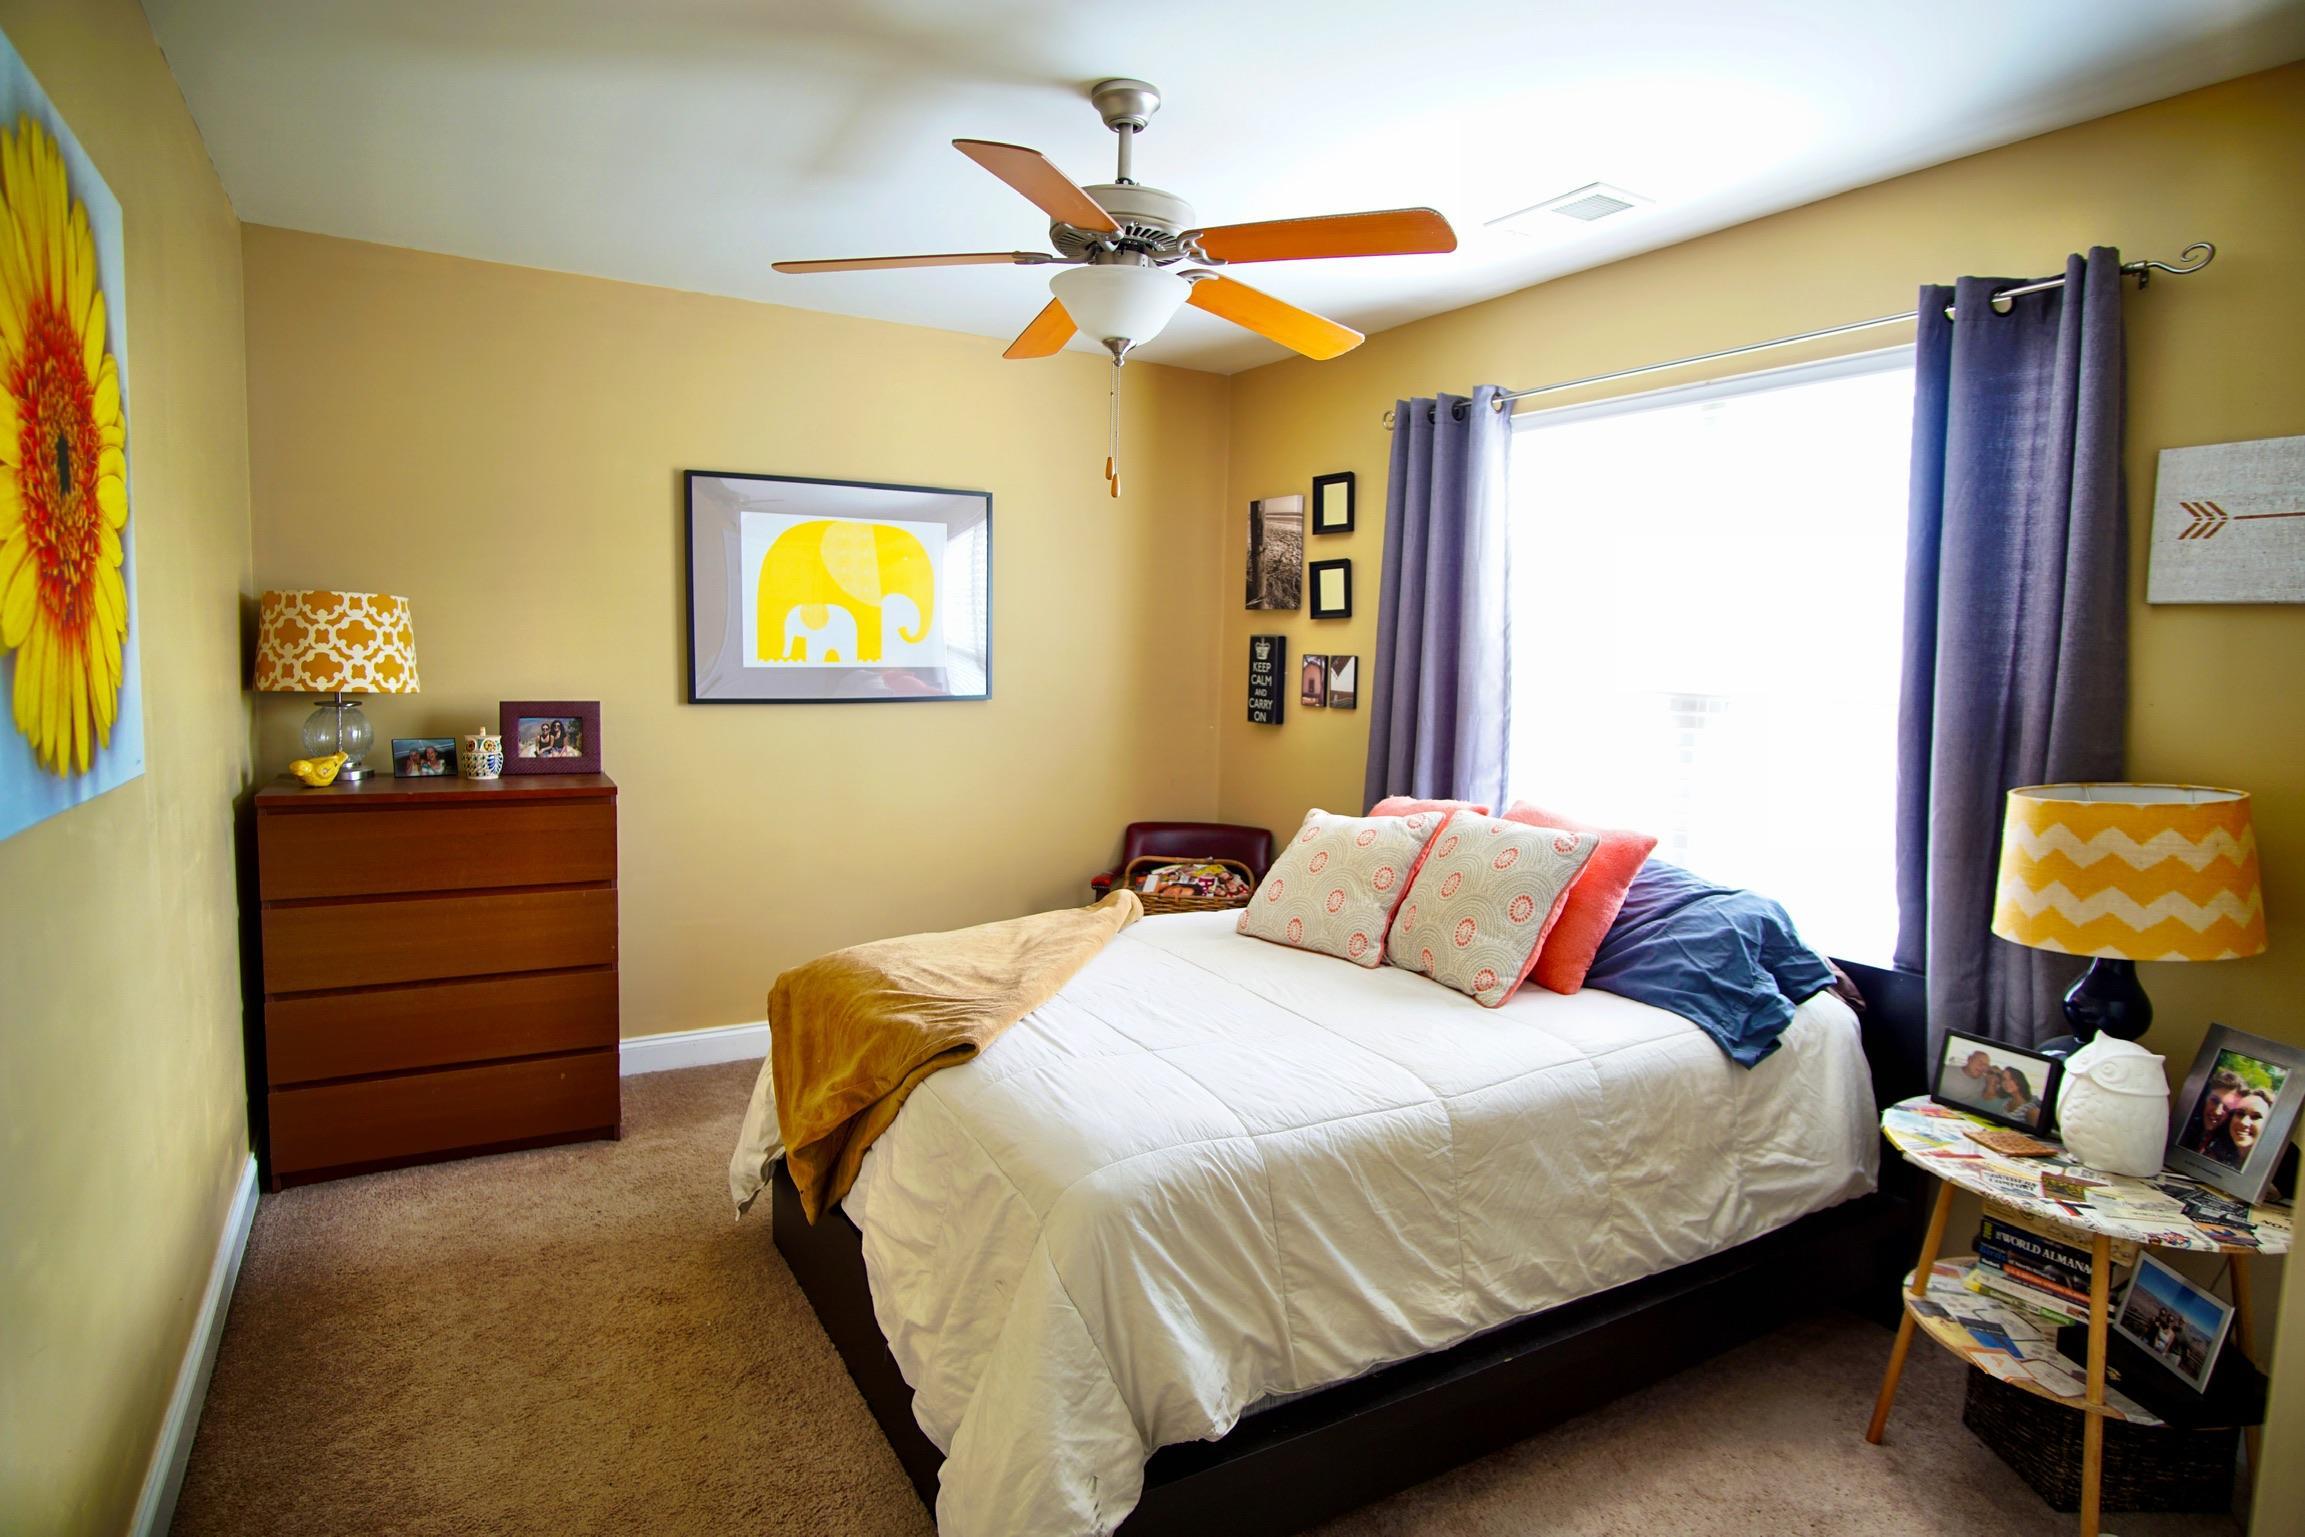 Colony North II Homes For Sale - 7828 Magellan, North Charleston, SC - 10